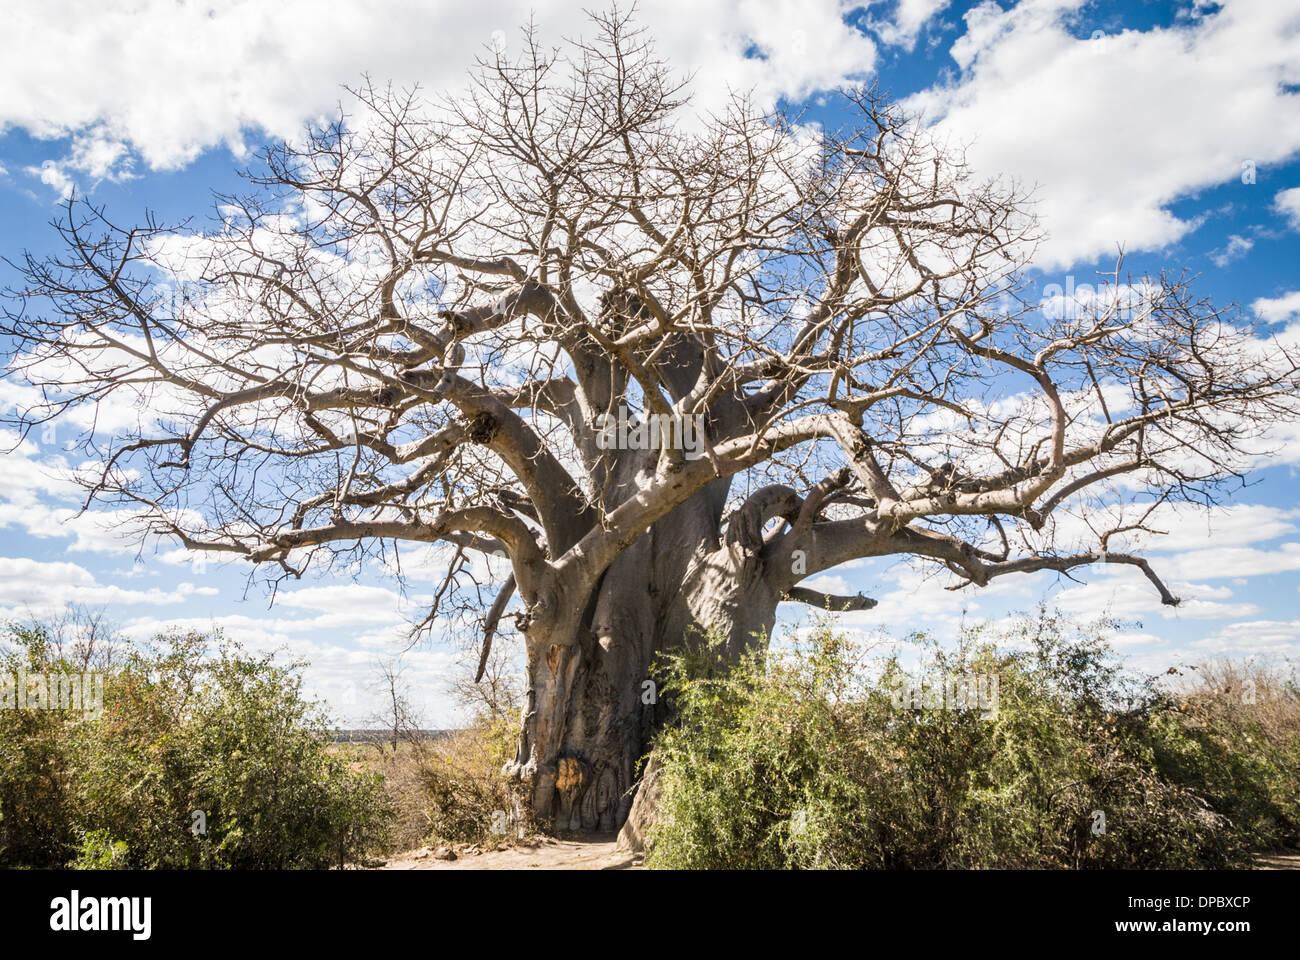 Big Baobab tree in Muhembo Game reserve, Namibia, Africa - Stock Image